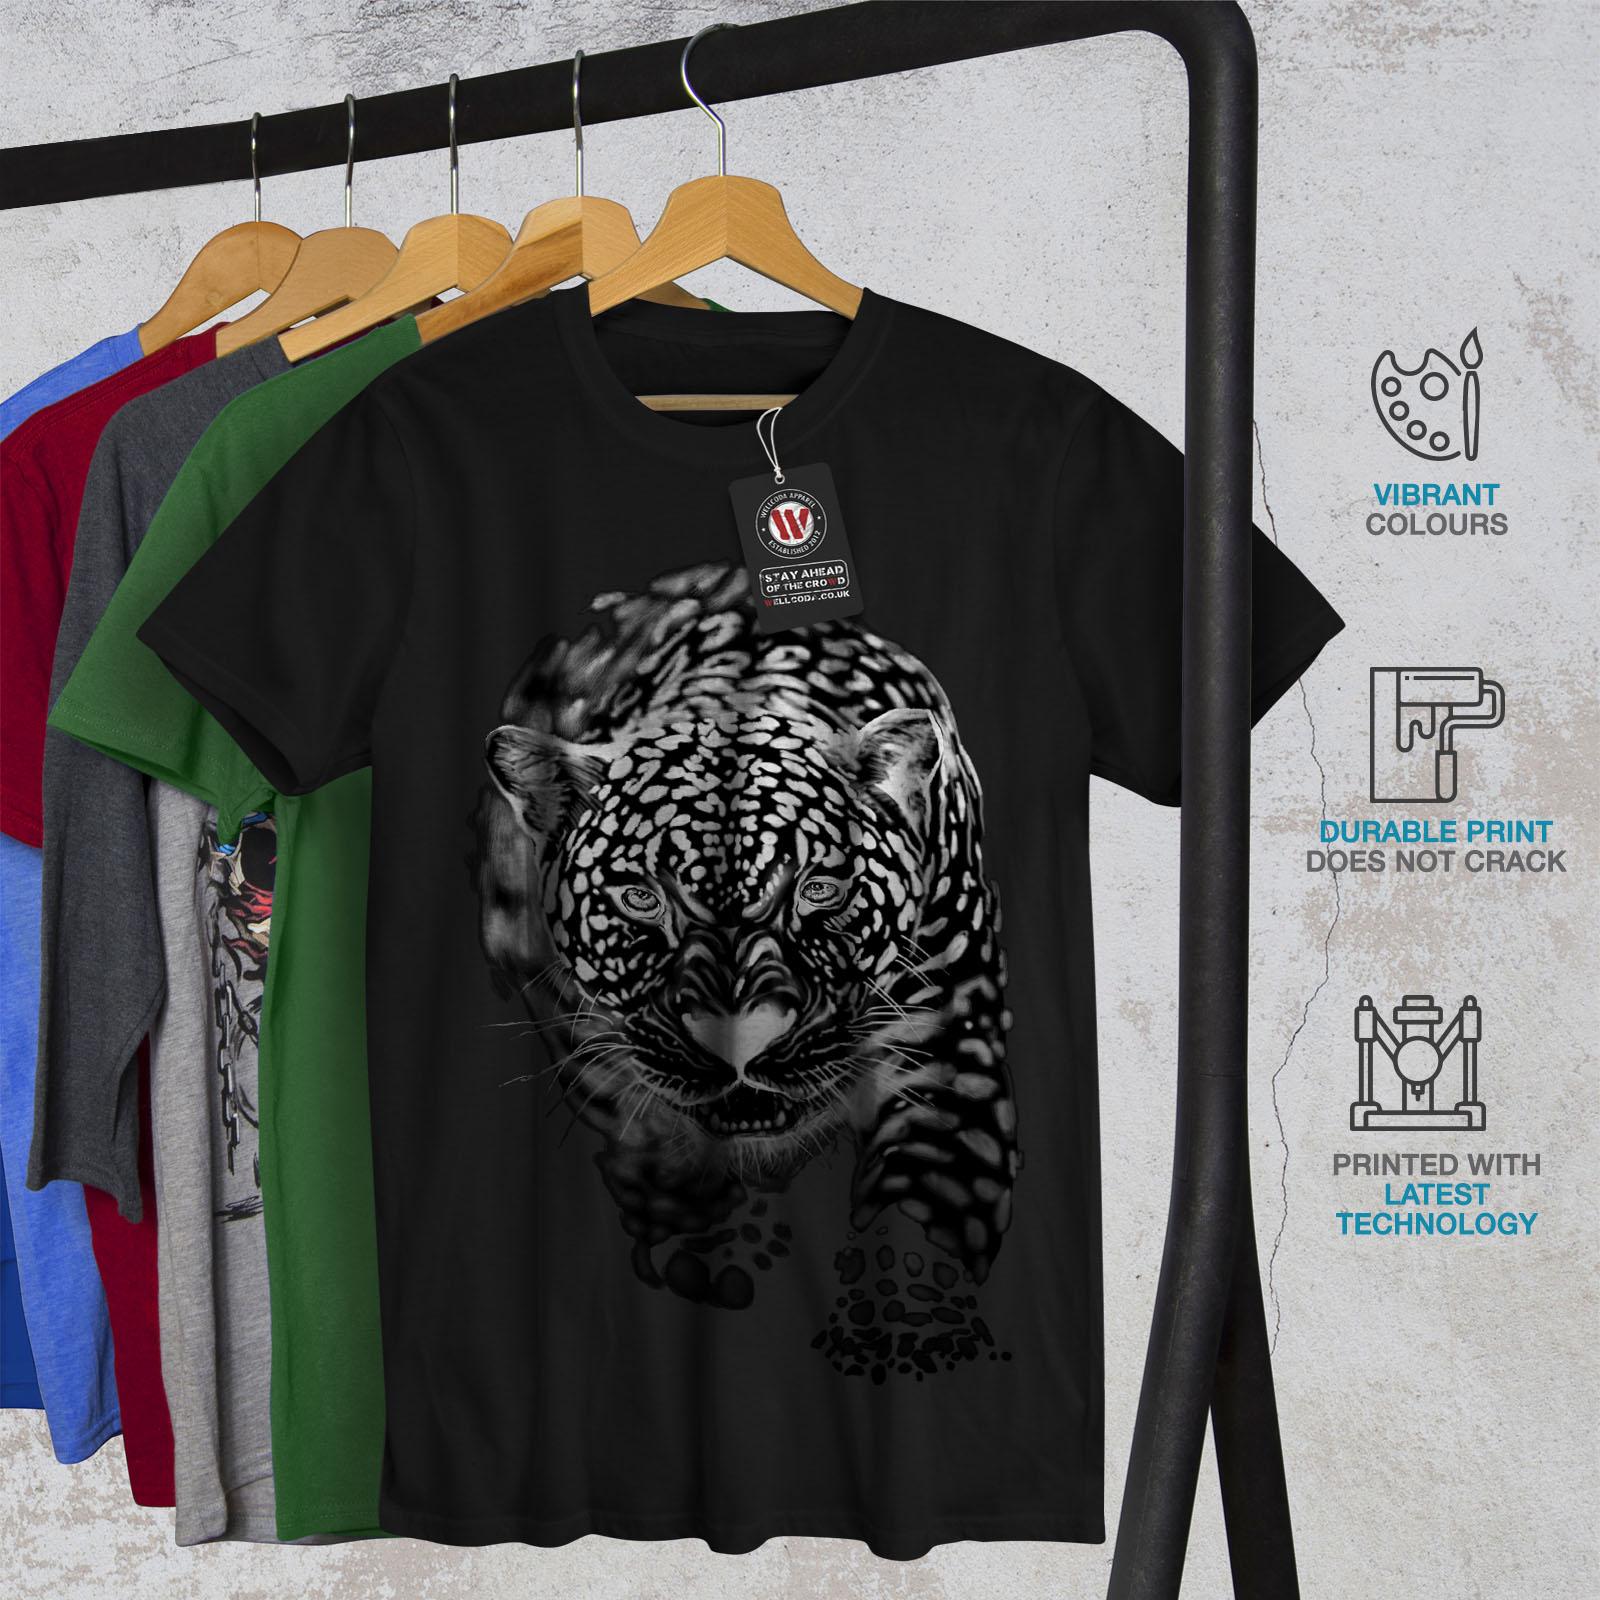 Wellcoda-Cougar-Puma-asesino-para-hombre-Camiseta-Gato-Camiseta-Impresa-Diseno-Grafico